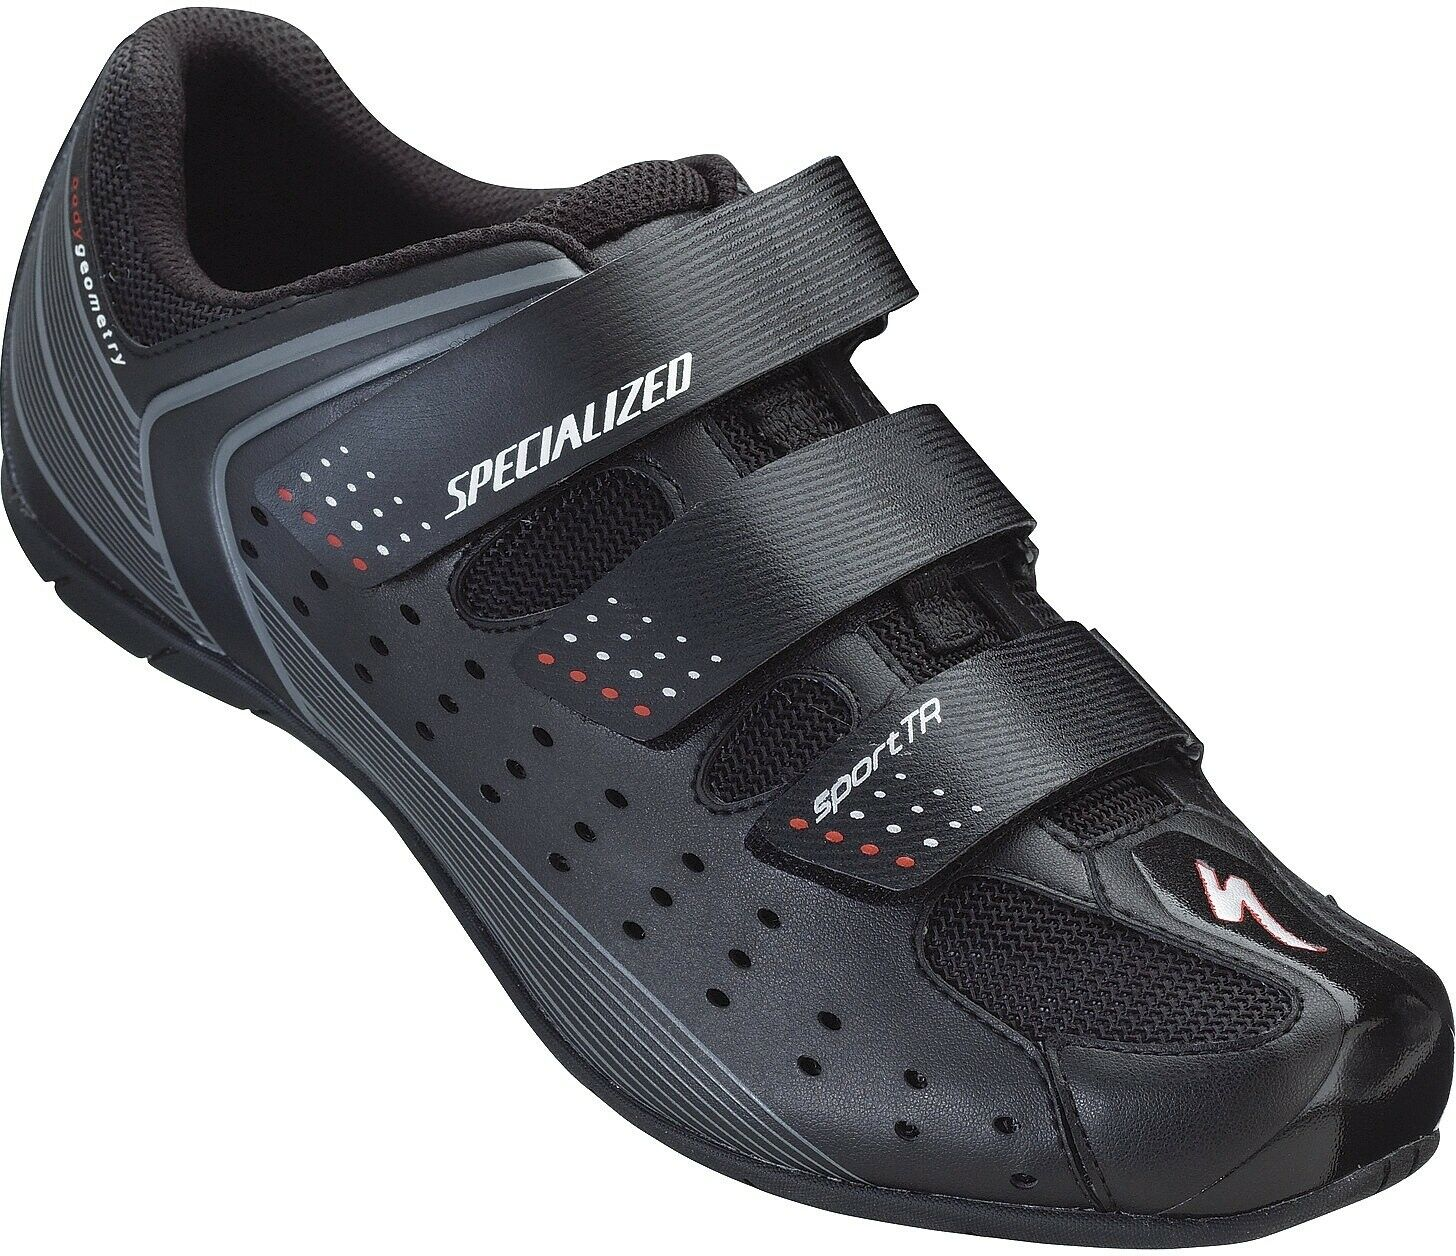 Sport Touring Mtb Specialized Hombre  Zapato EU 40 nos 7.5 Negro Nuevo  sin mínimo